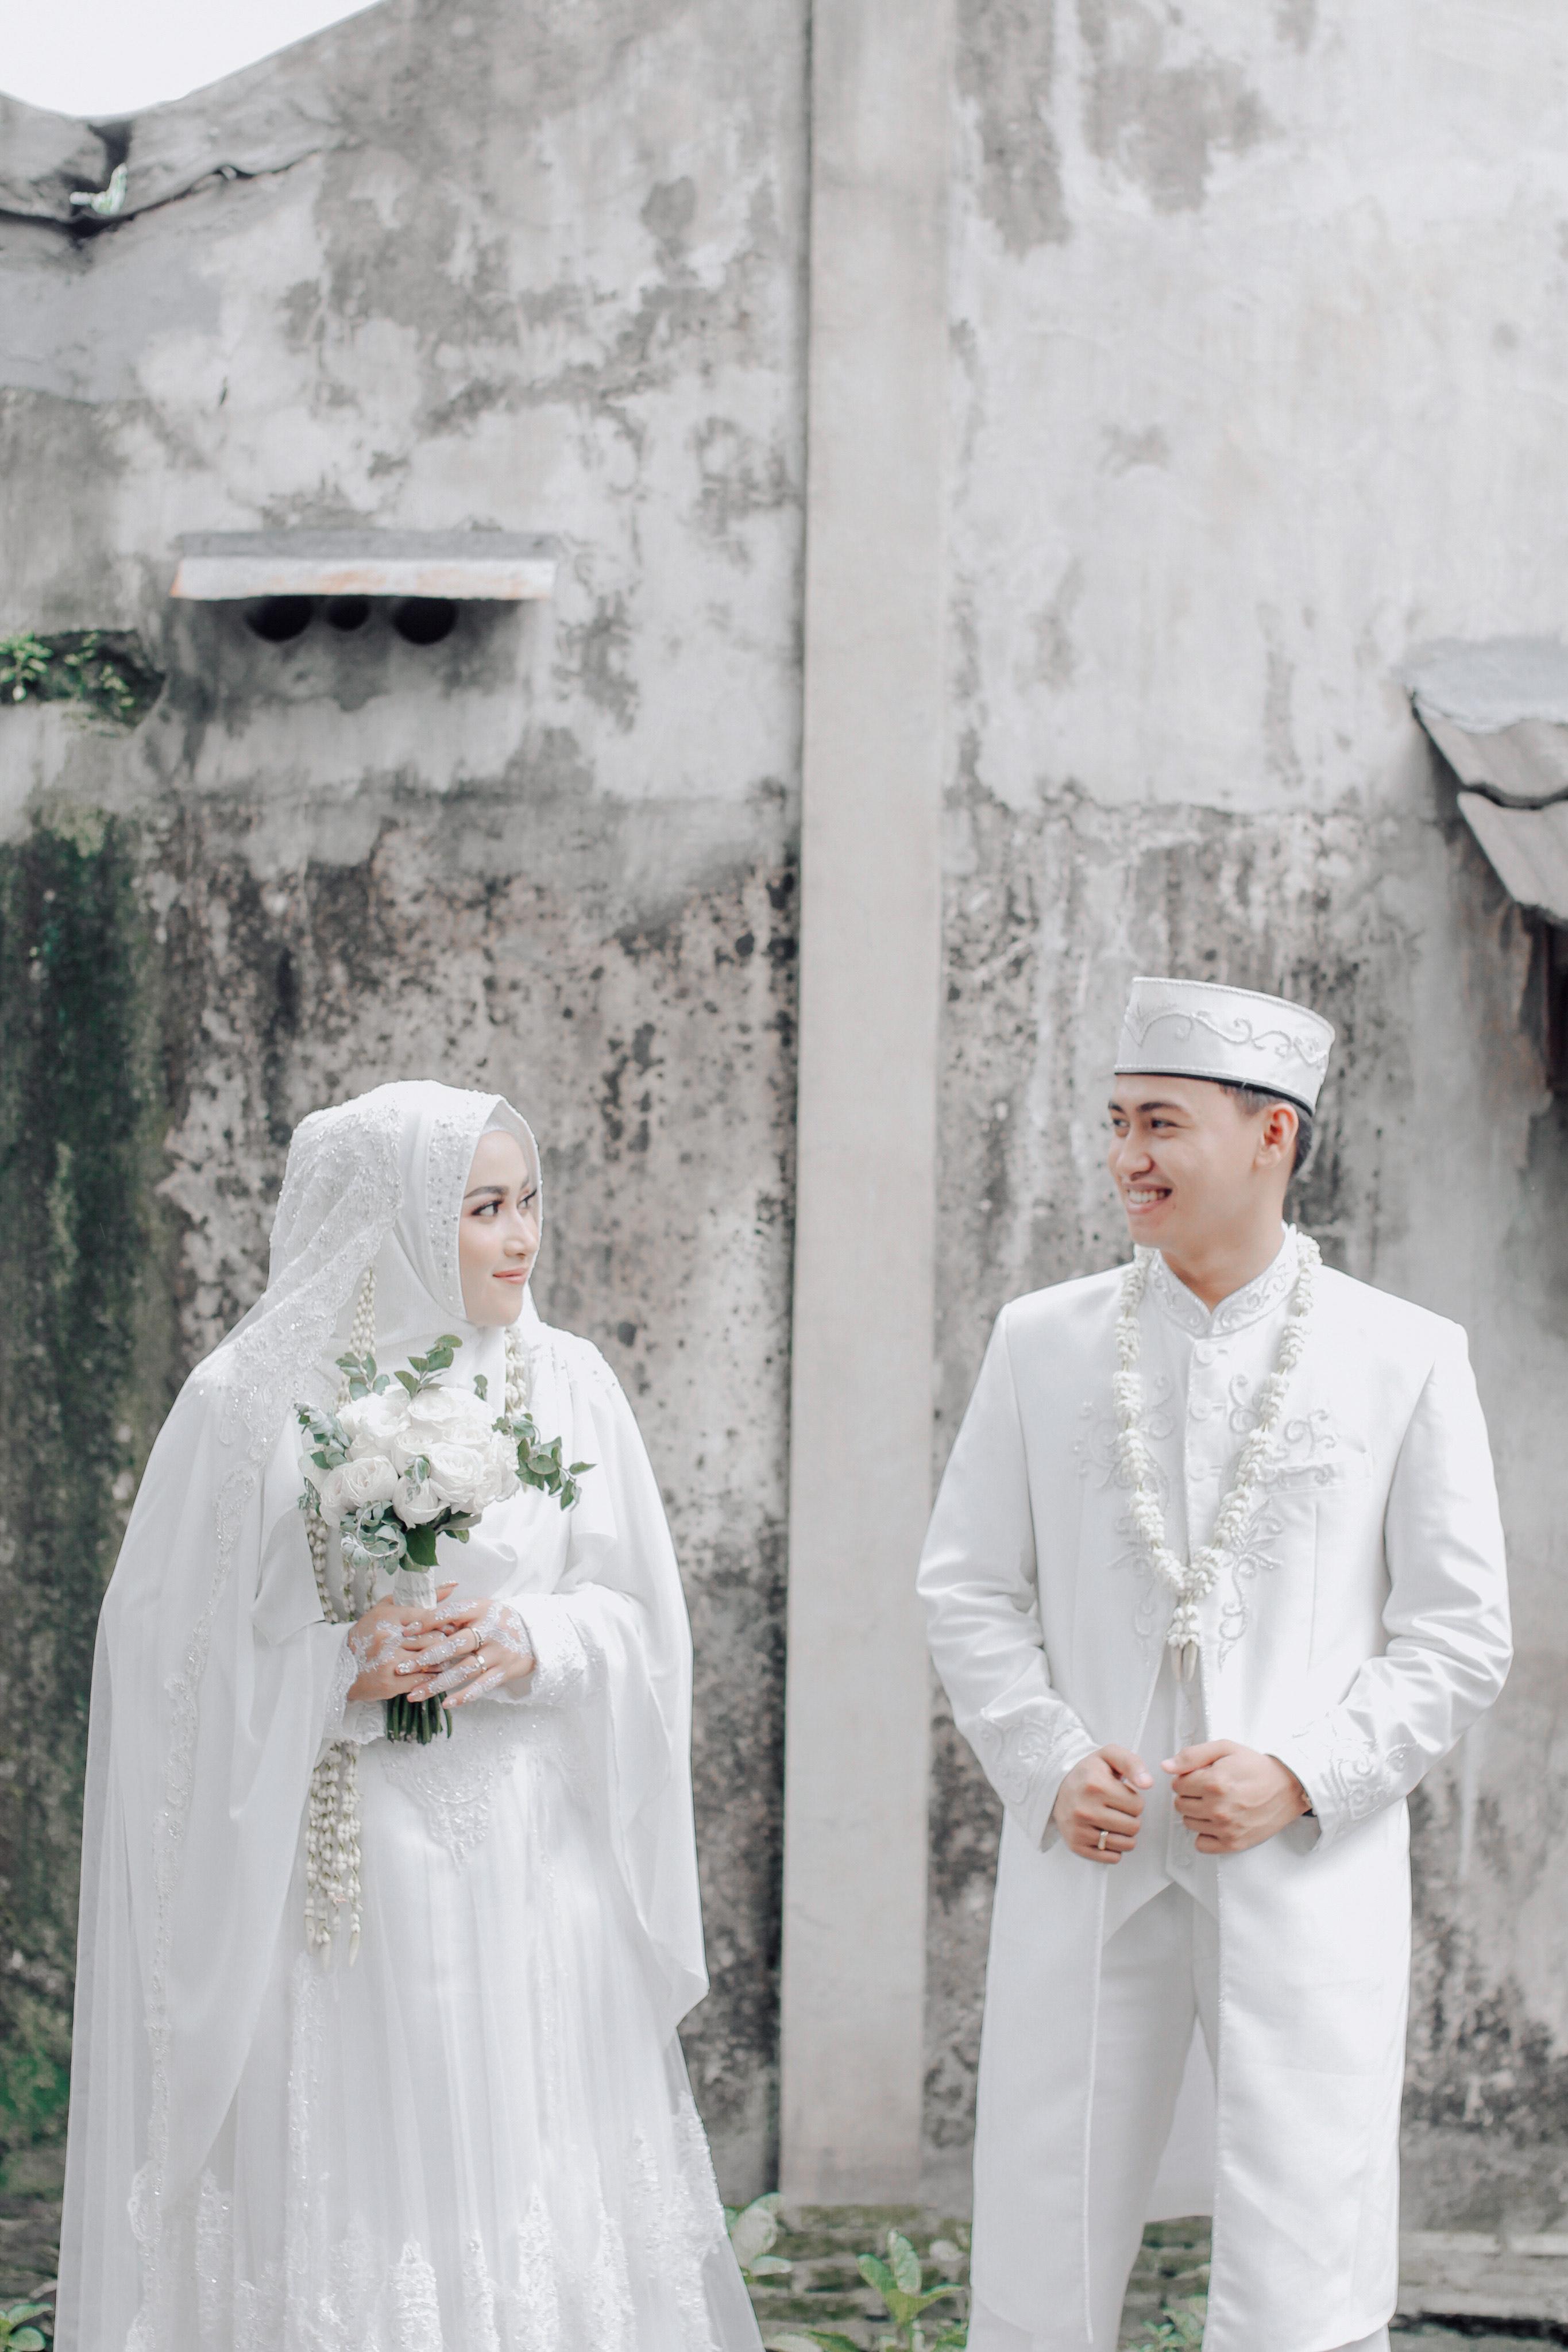 Baju Akad Nikah Pria : nikah, Bridesmaid, Dresses, Accessories, Wedding, Vendors, Alvor, Bridestory.com